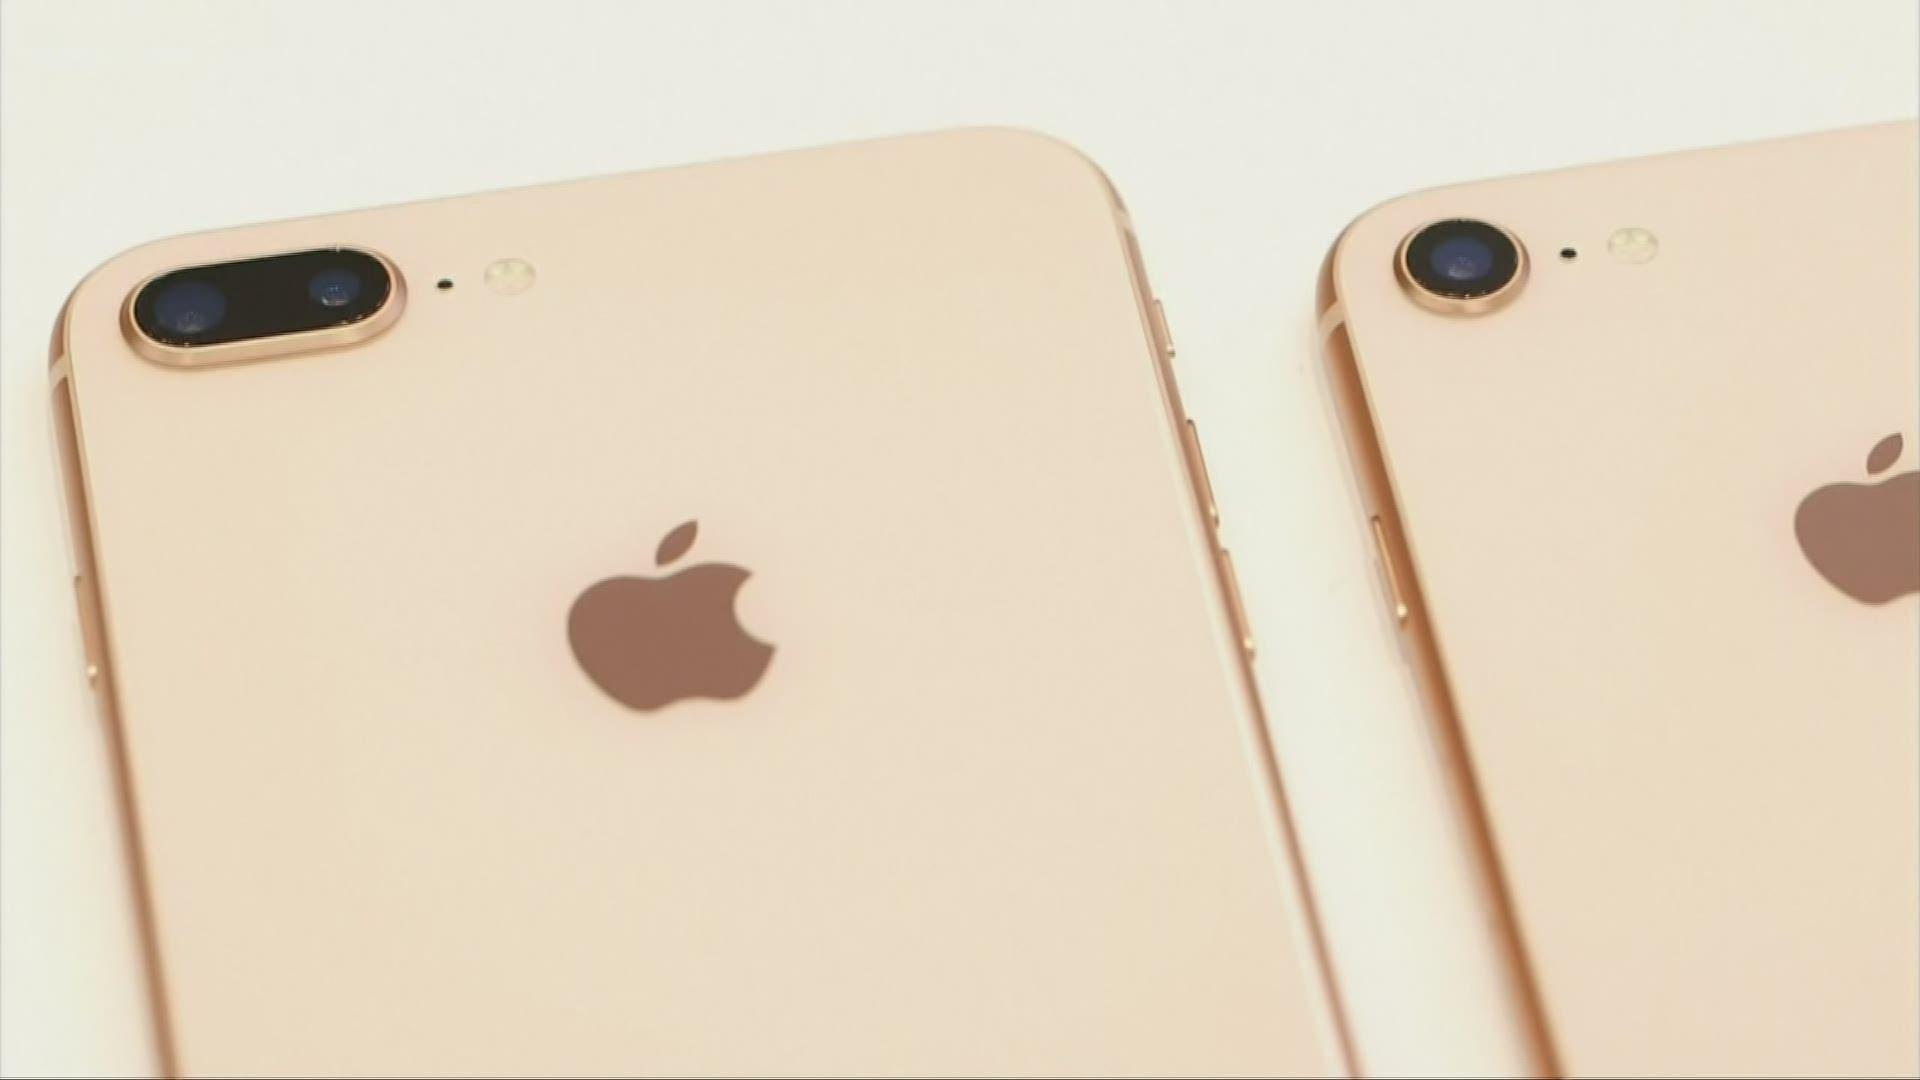 How To Disinfect Your Iphone Apple Updates Its Health Advice Amid Coronavirus Wkyc Com